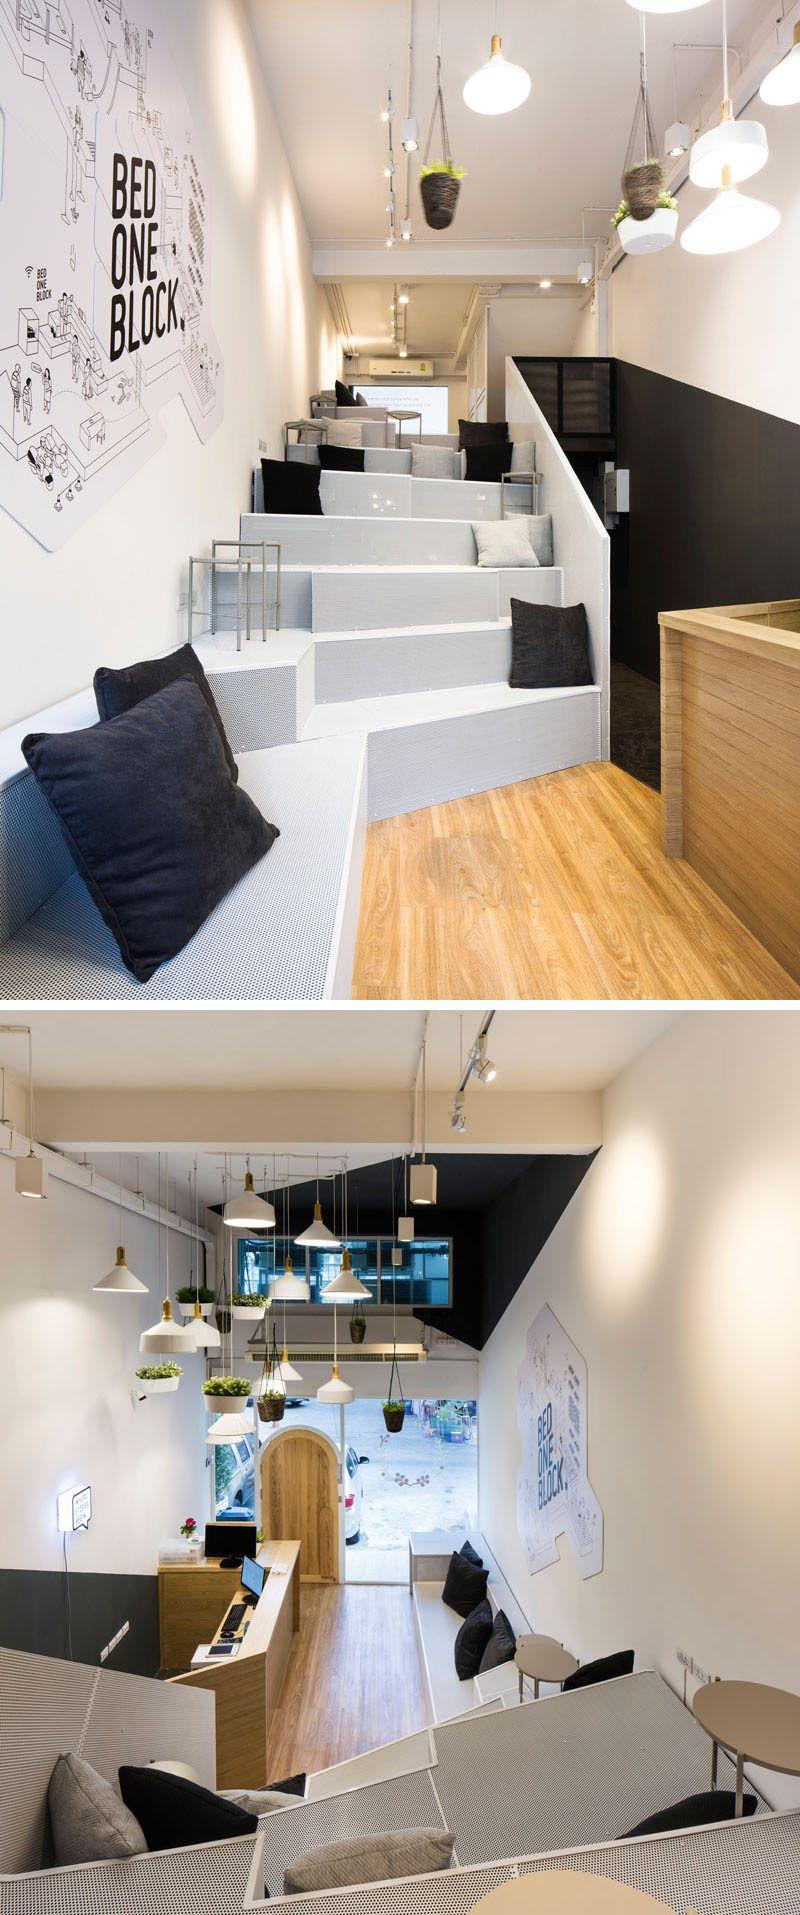 Hotel Room Desk: This Modern Hostel Design In Bangkok, Thailand Brings A